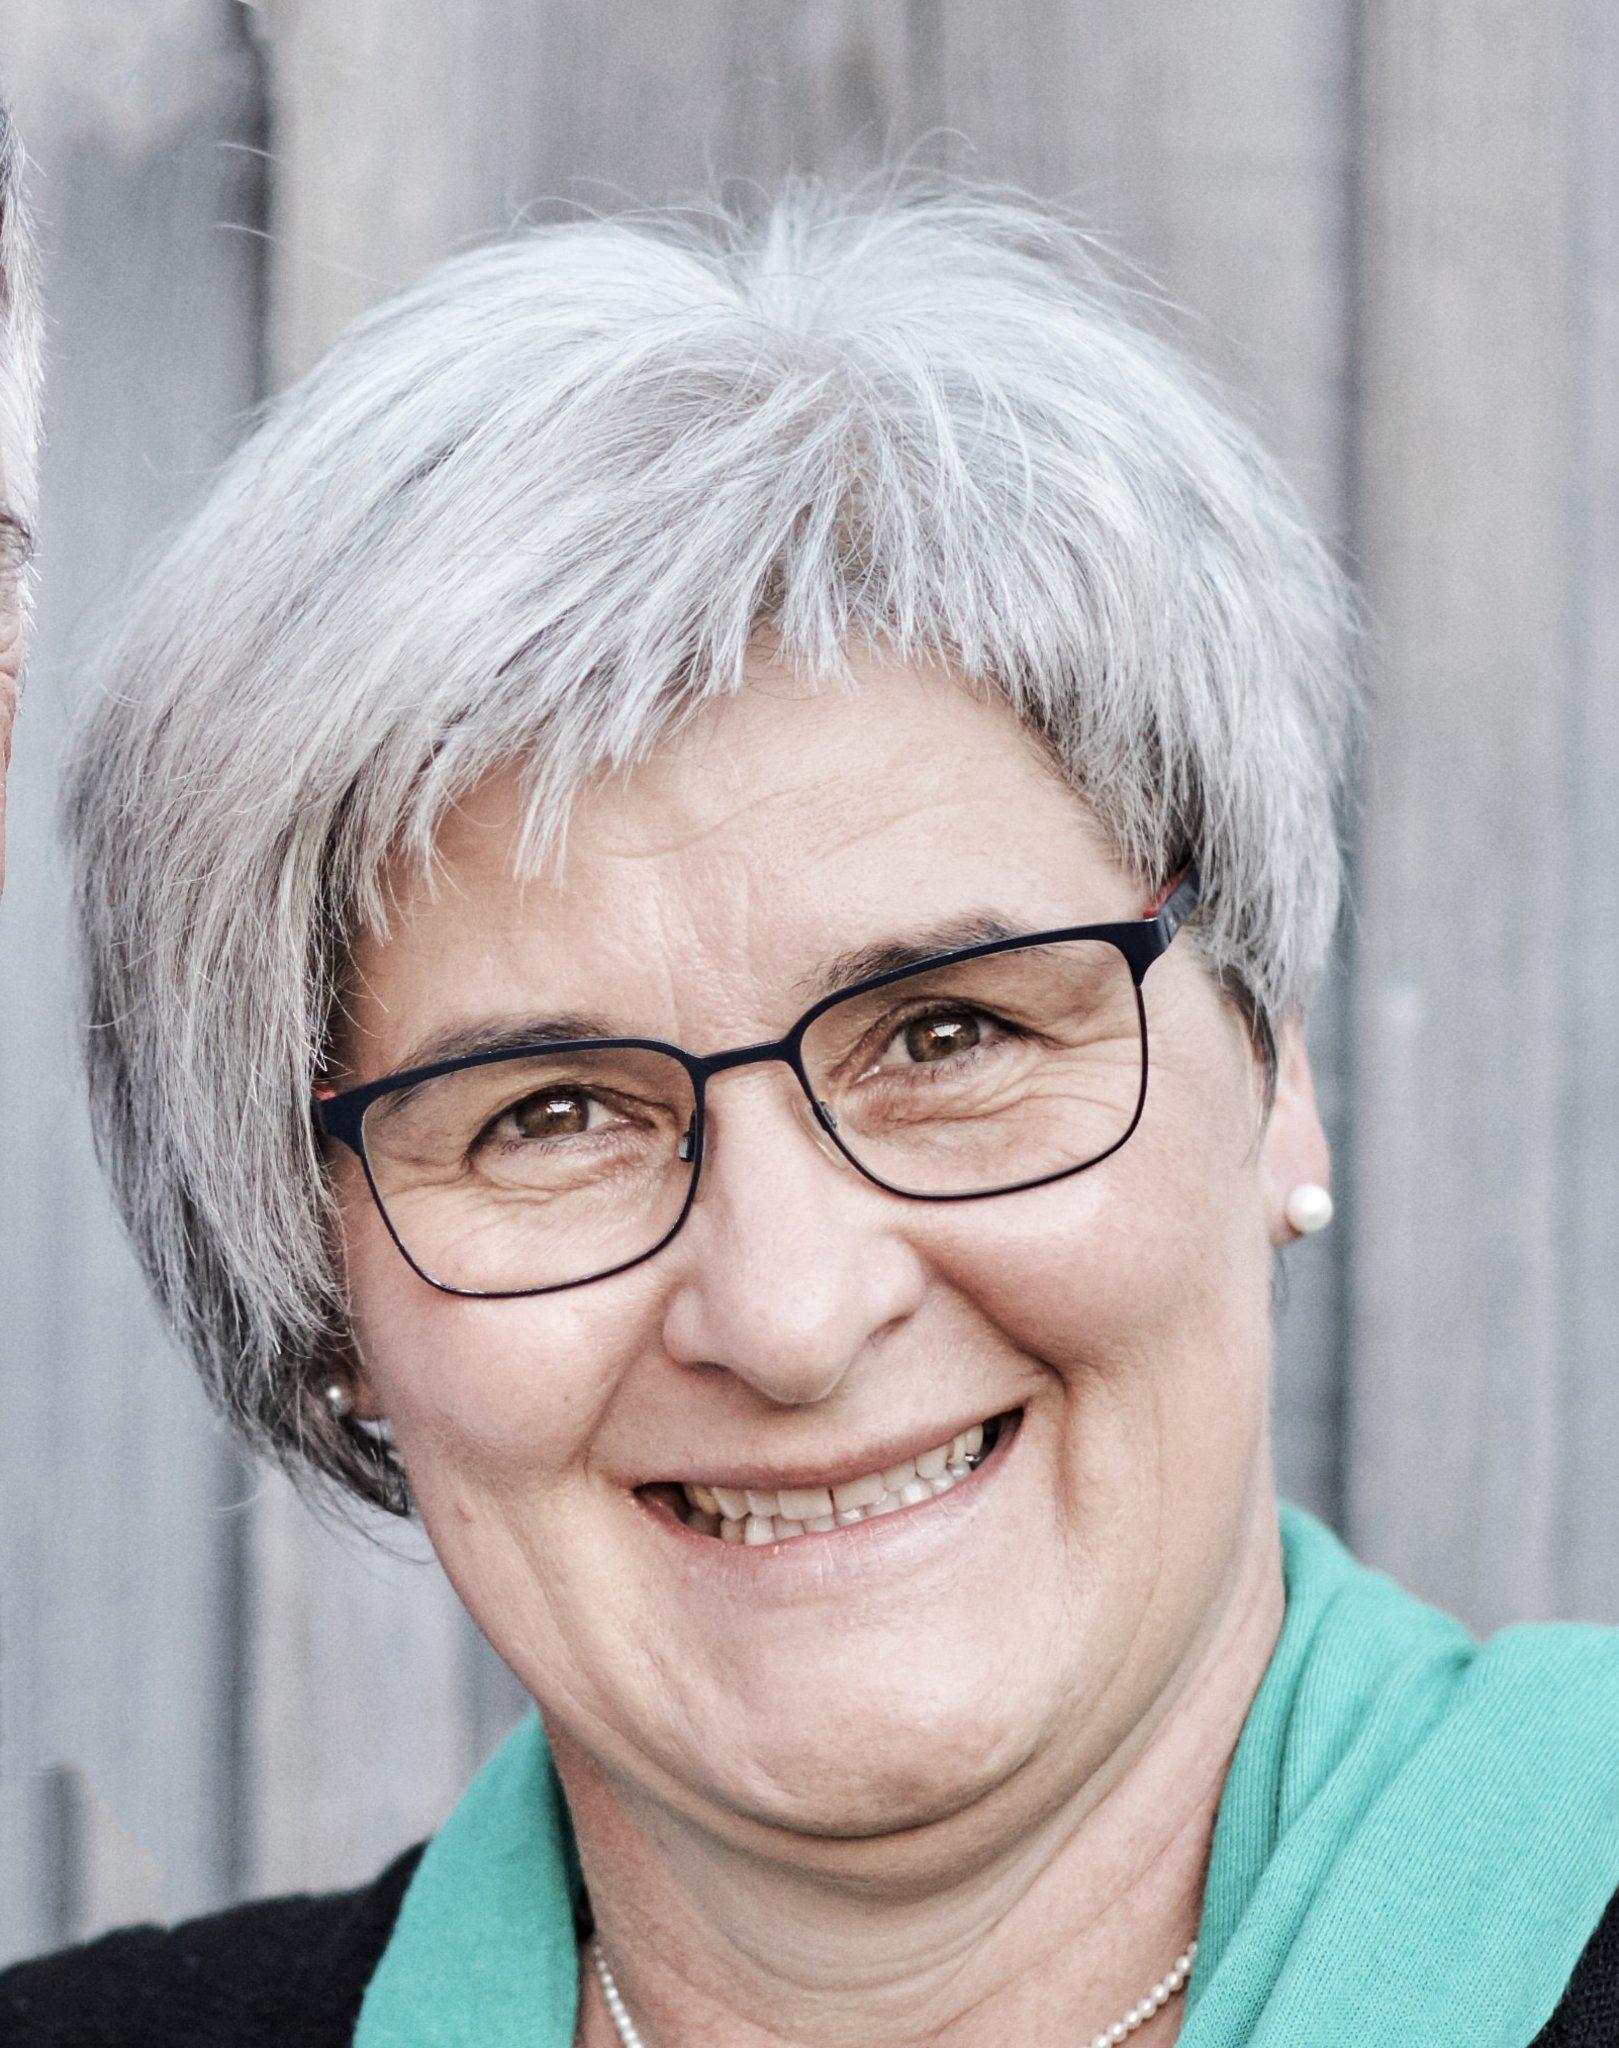 Eberschwang wo frauen kennenlernen Singleborse aus neuhofen